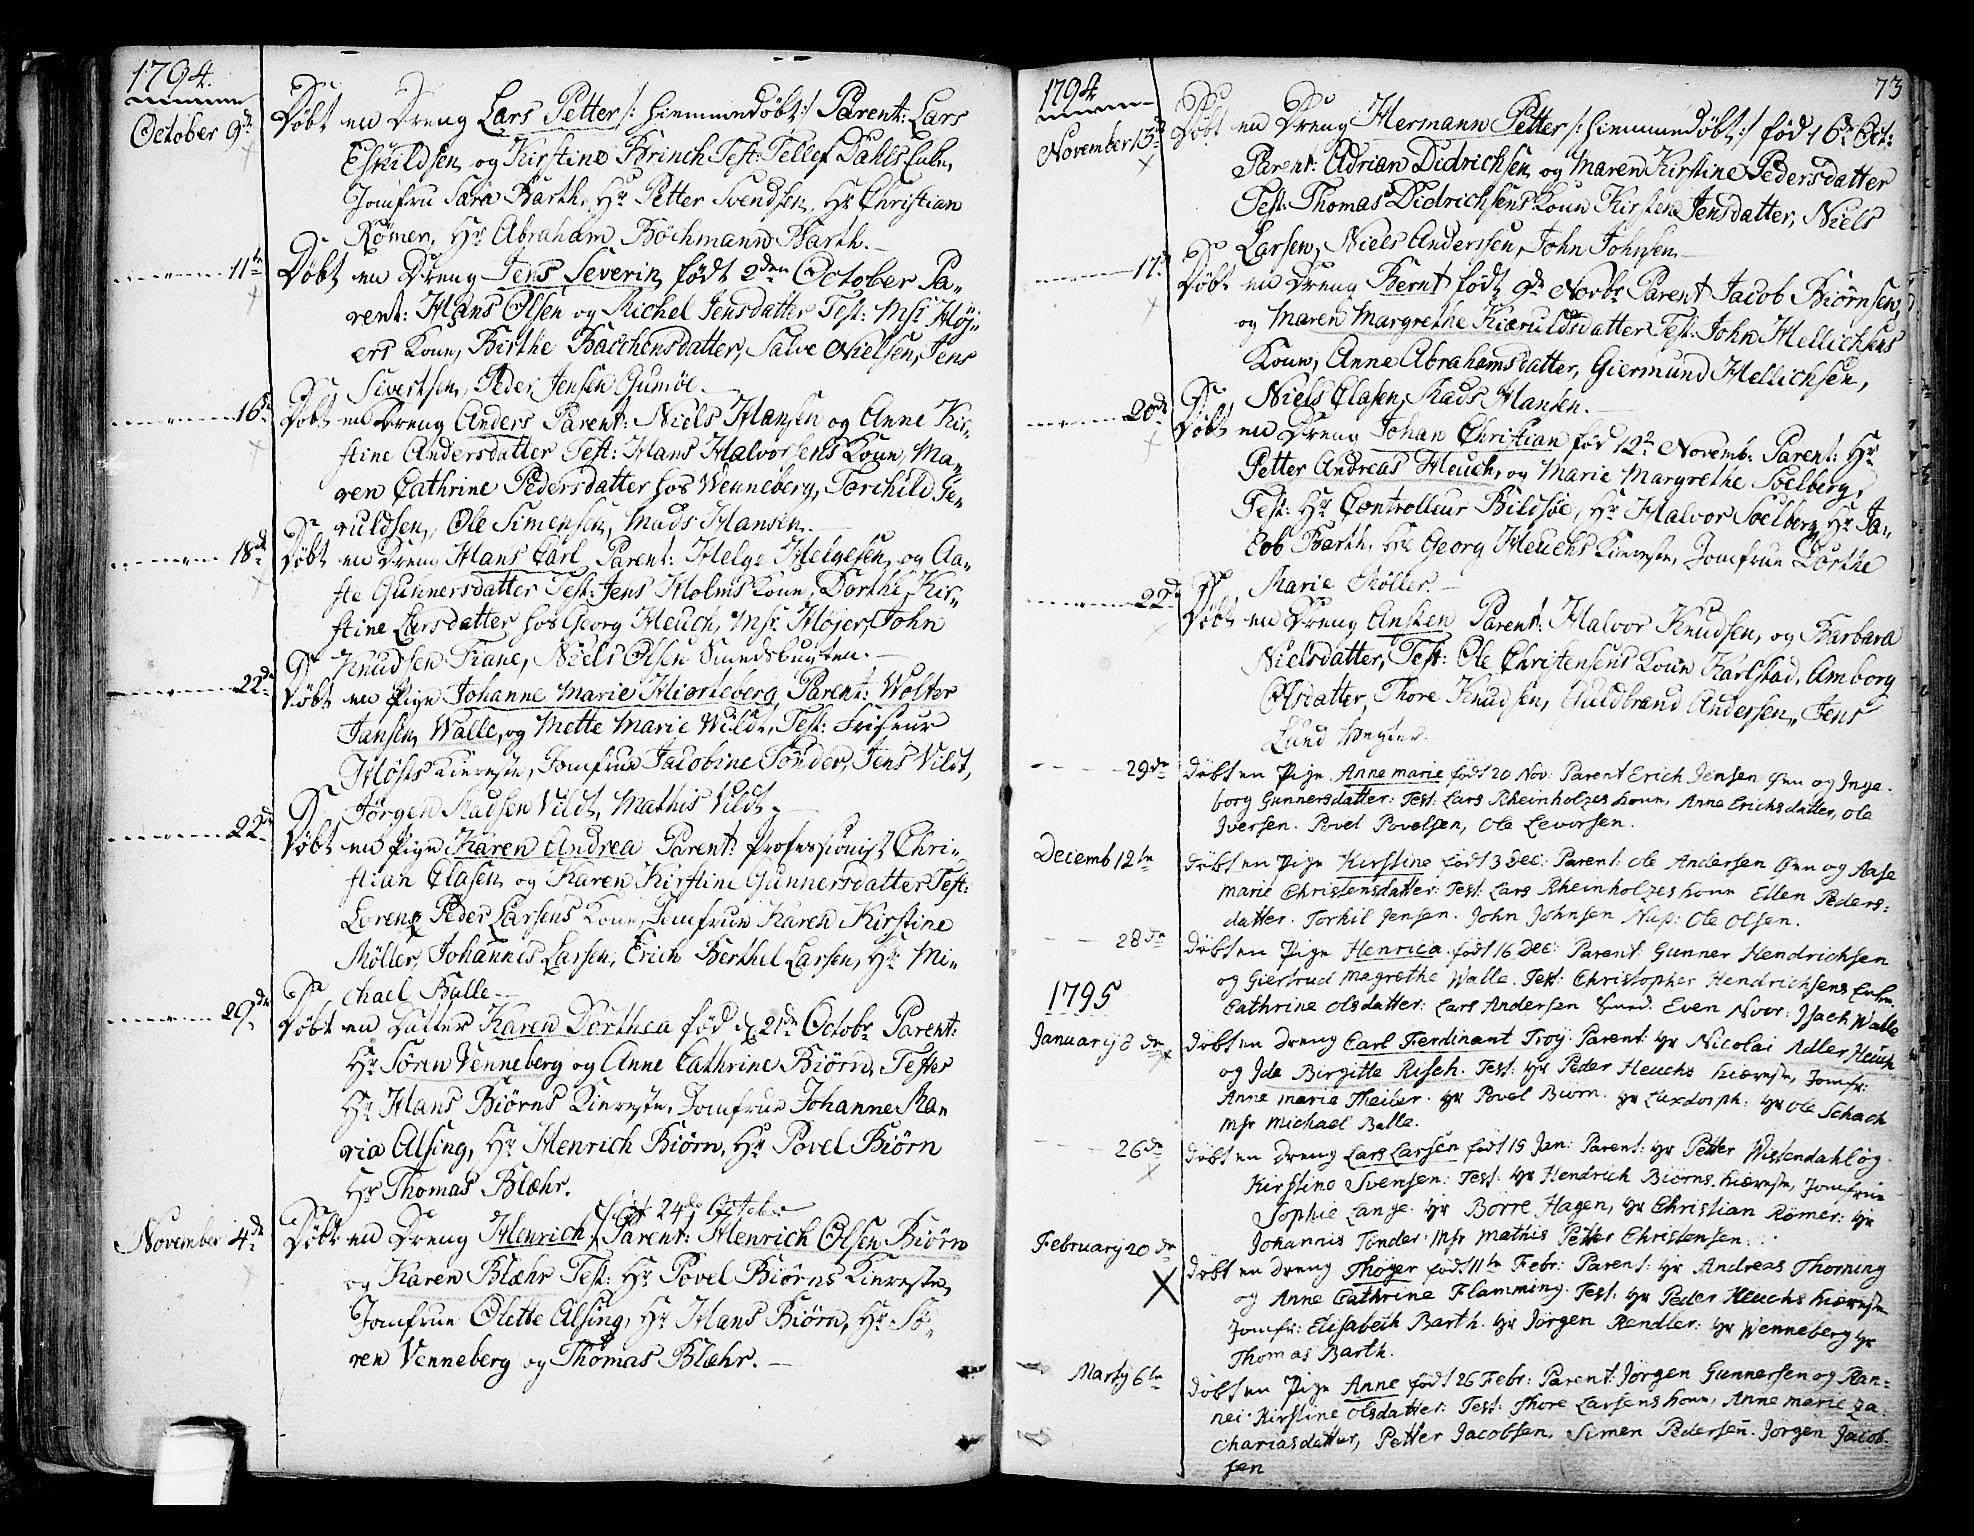 SAKO, Kragerø kirkebøker, F/Fa/L0002: Ministerialbok nr. 2, 1767-1802, s. 73